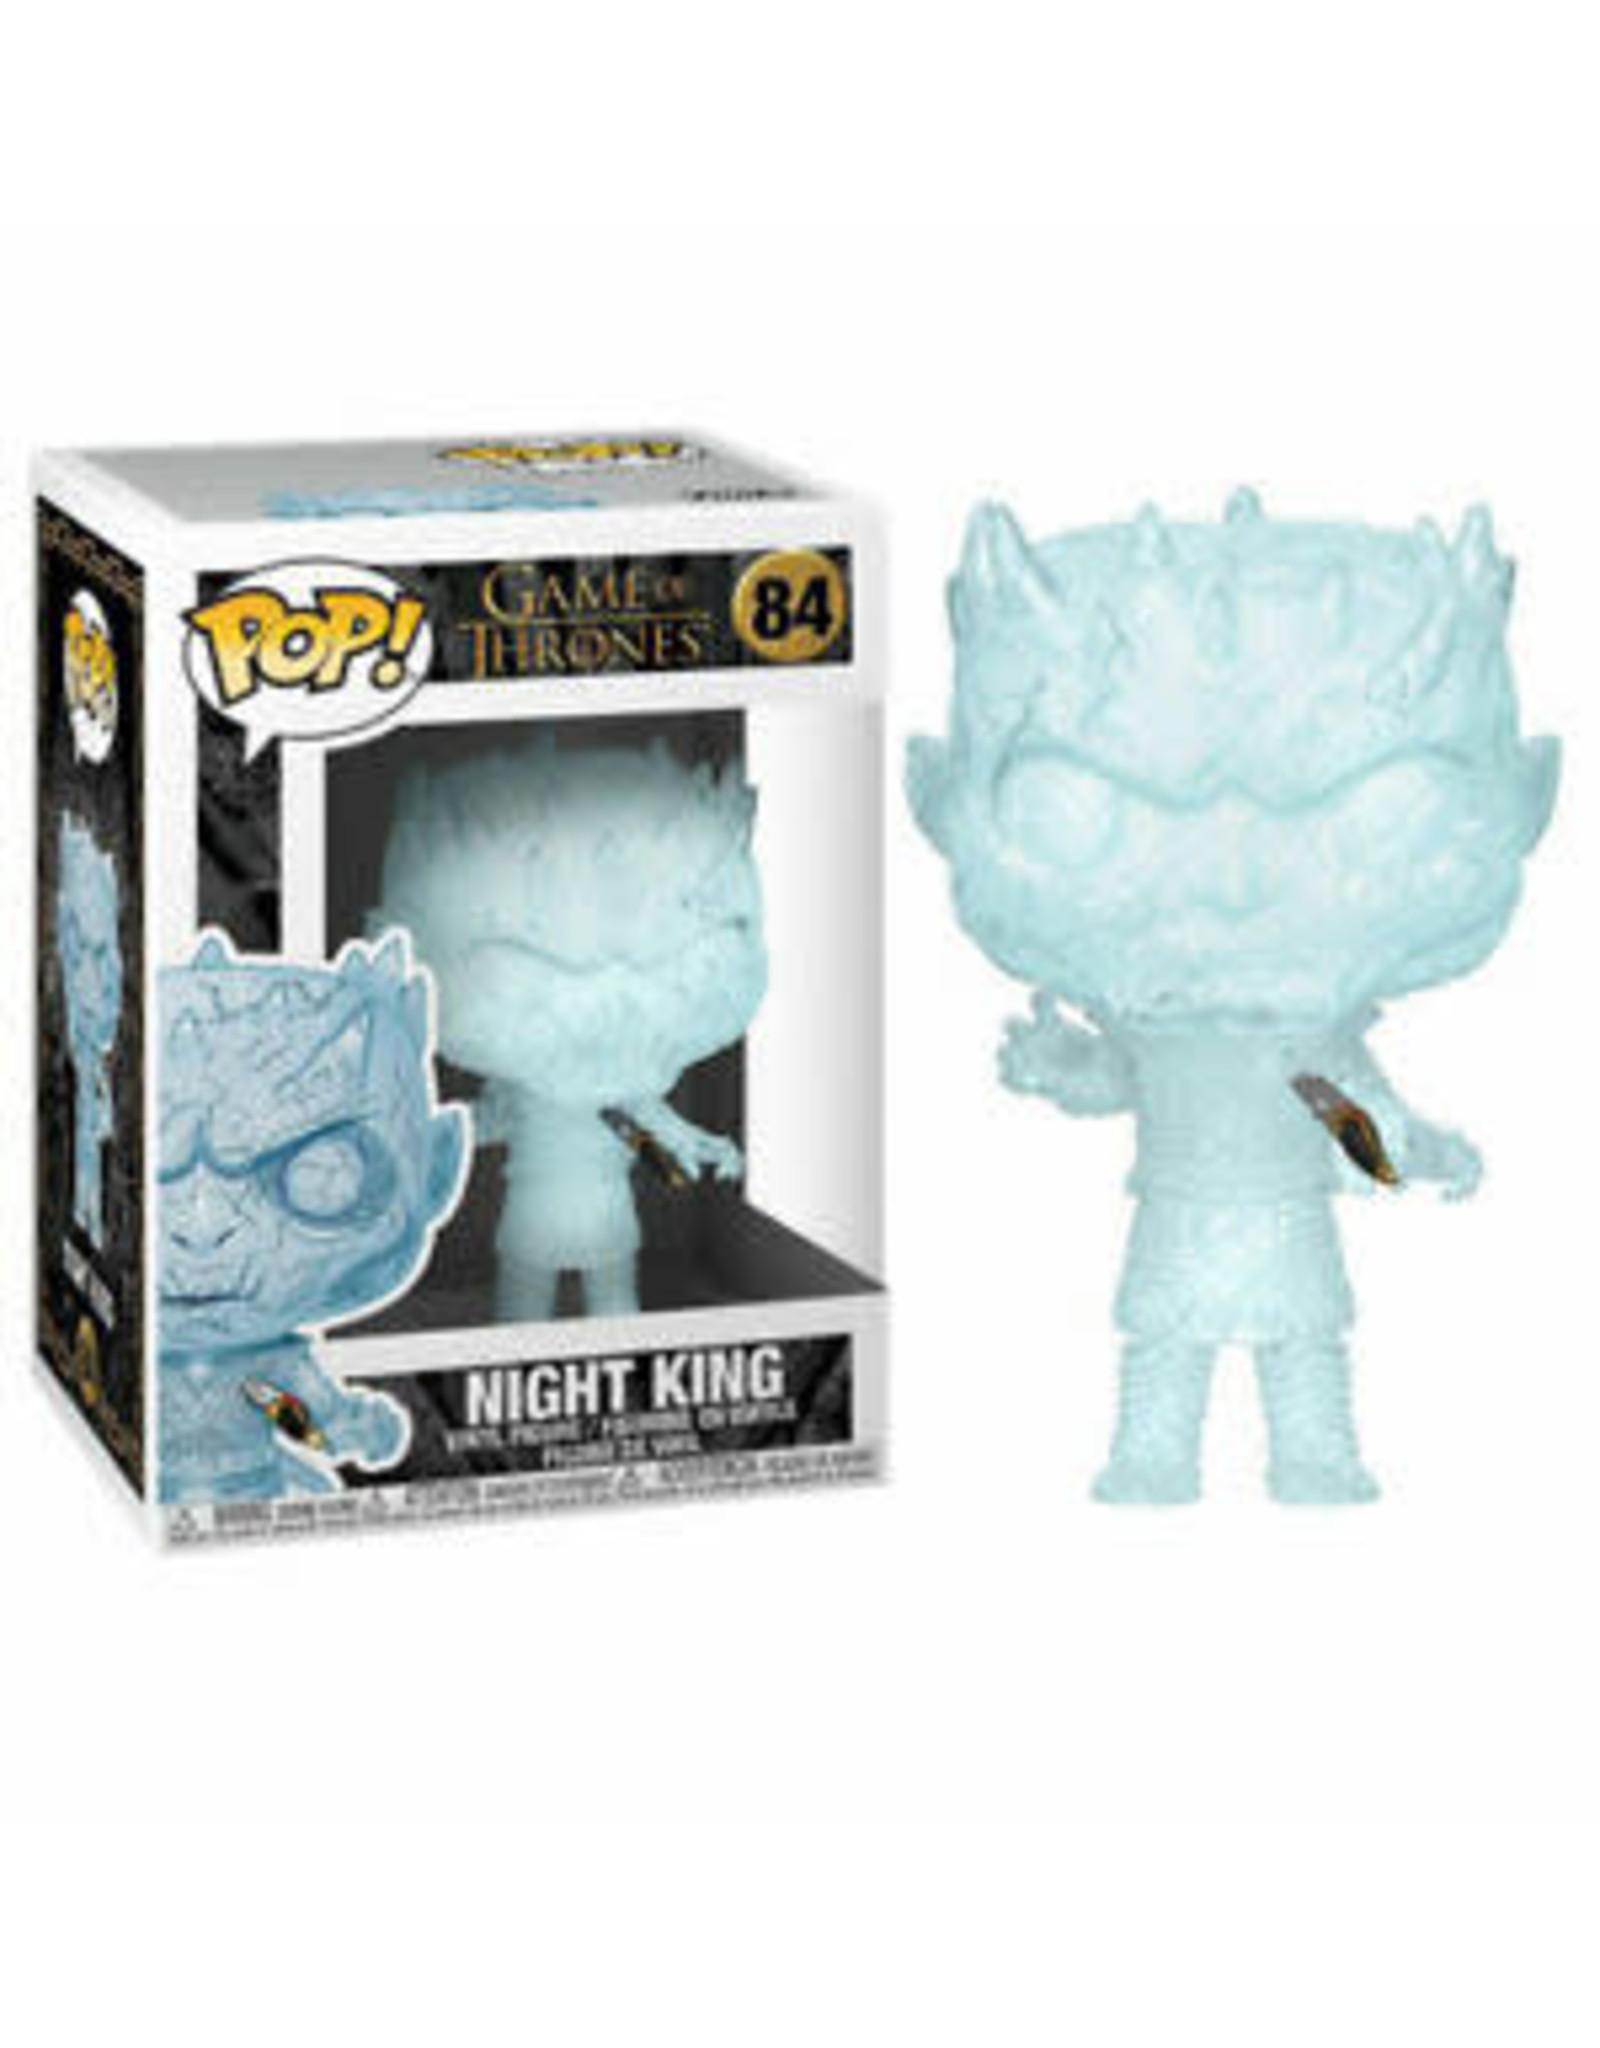 Funko Pop! Funko Pop! Game of Thrones nr084 Night King